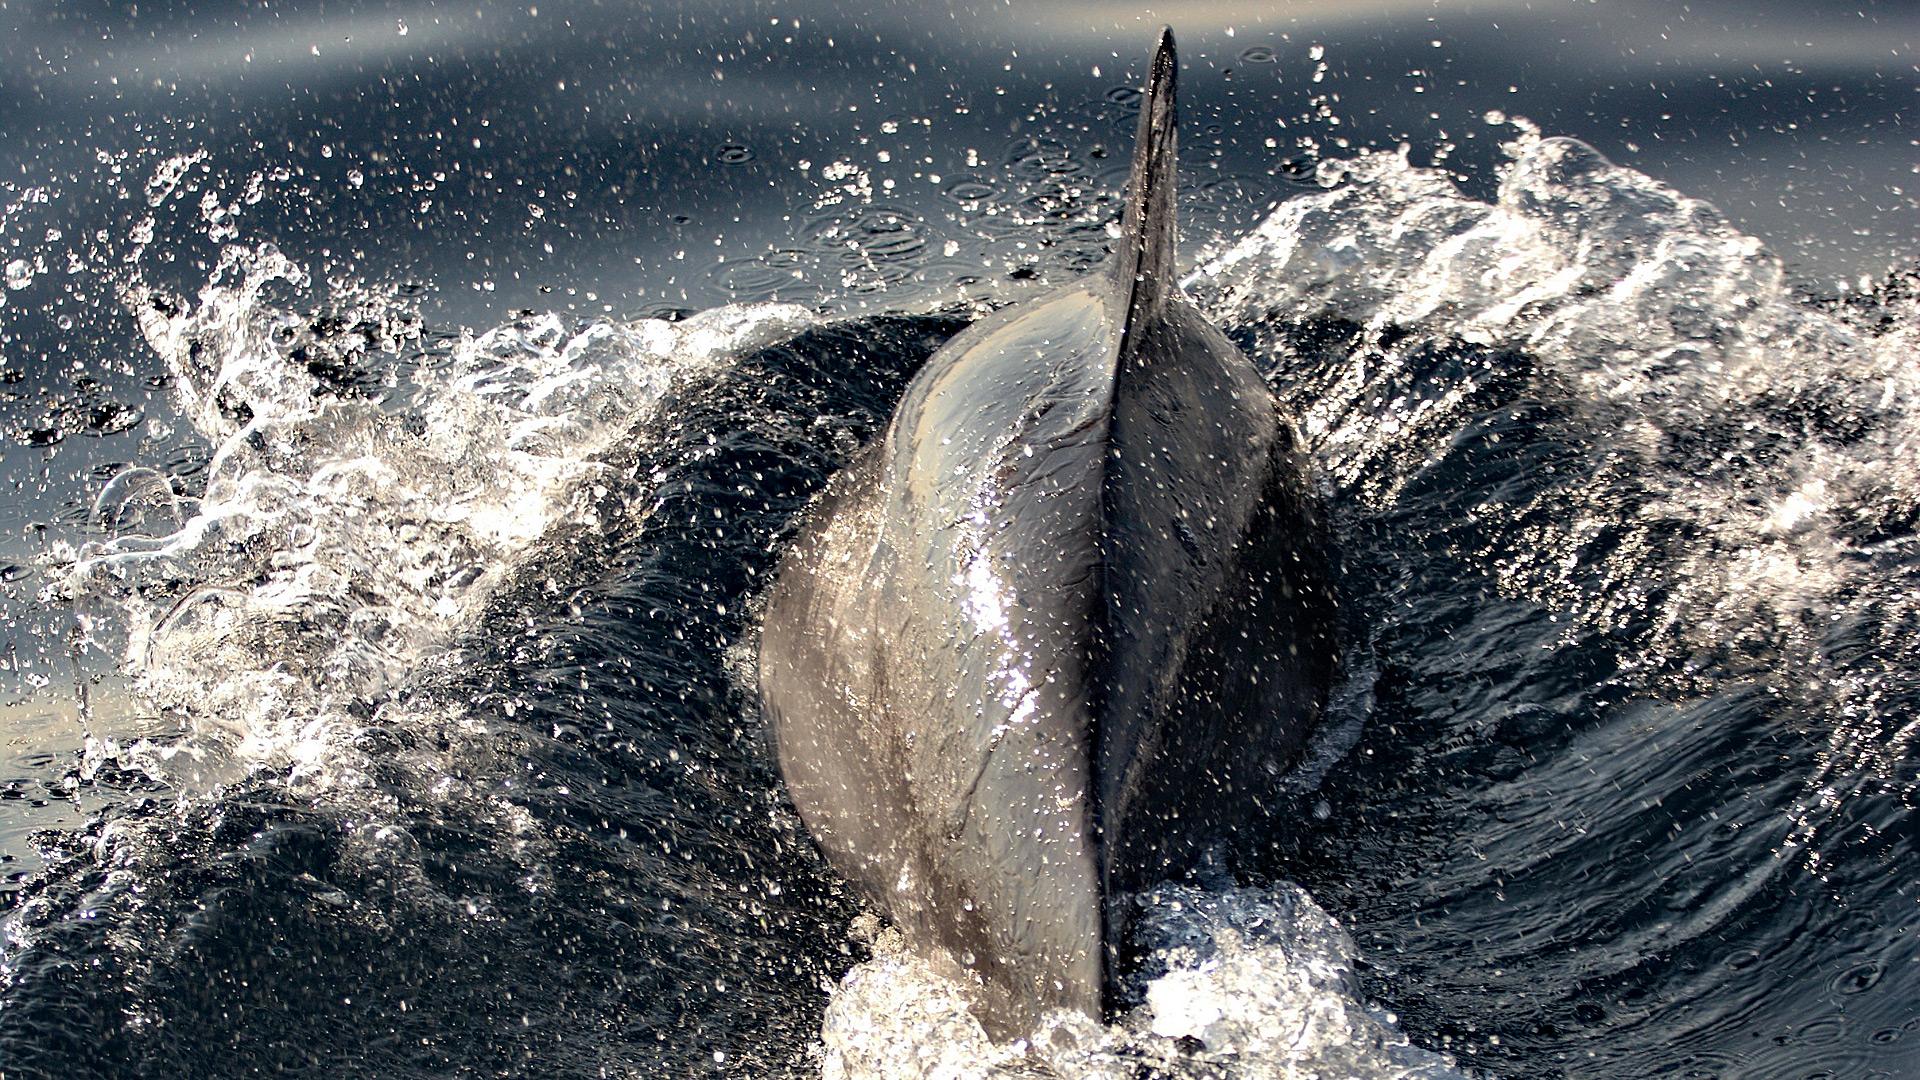 Delfinsichtung Adria.